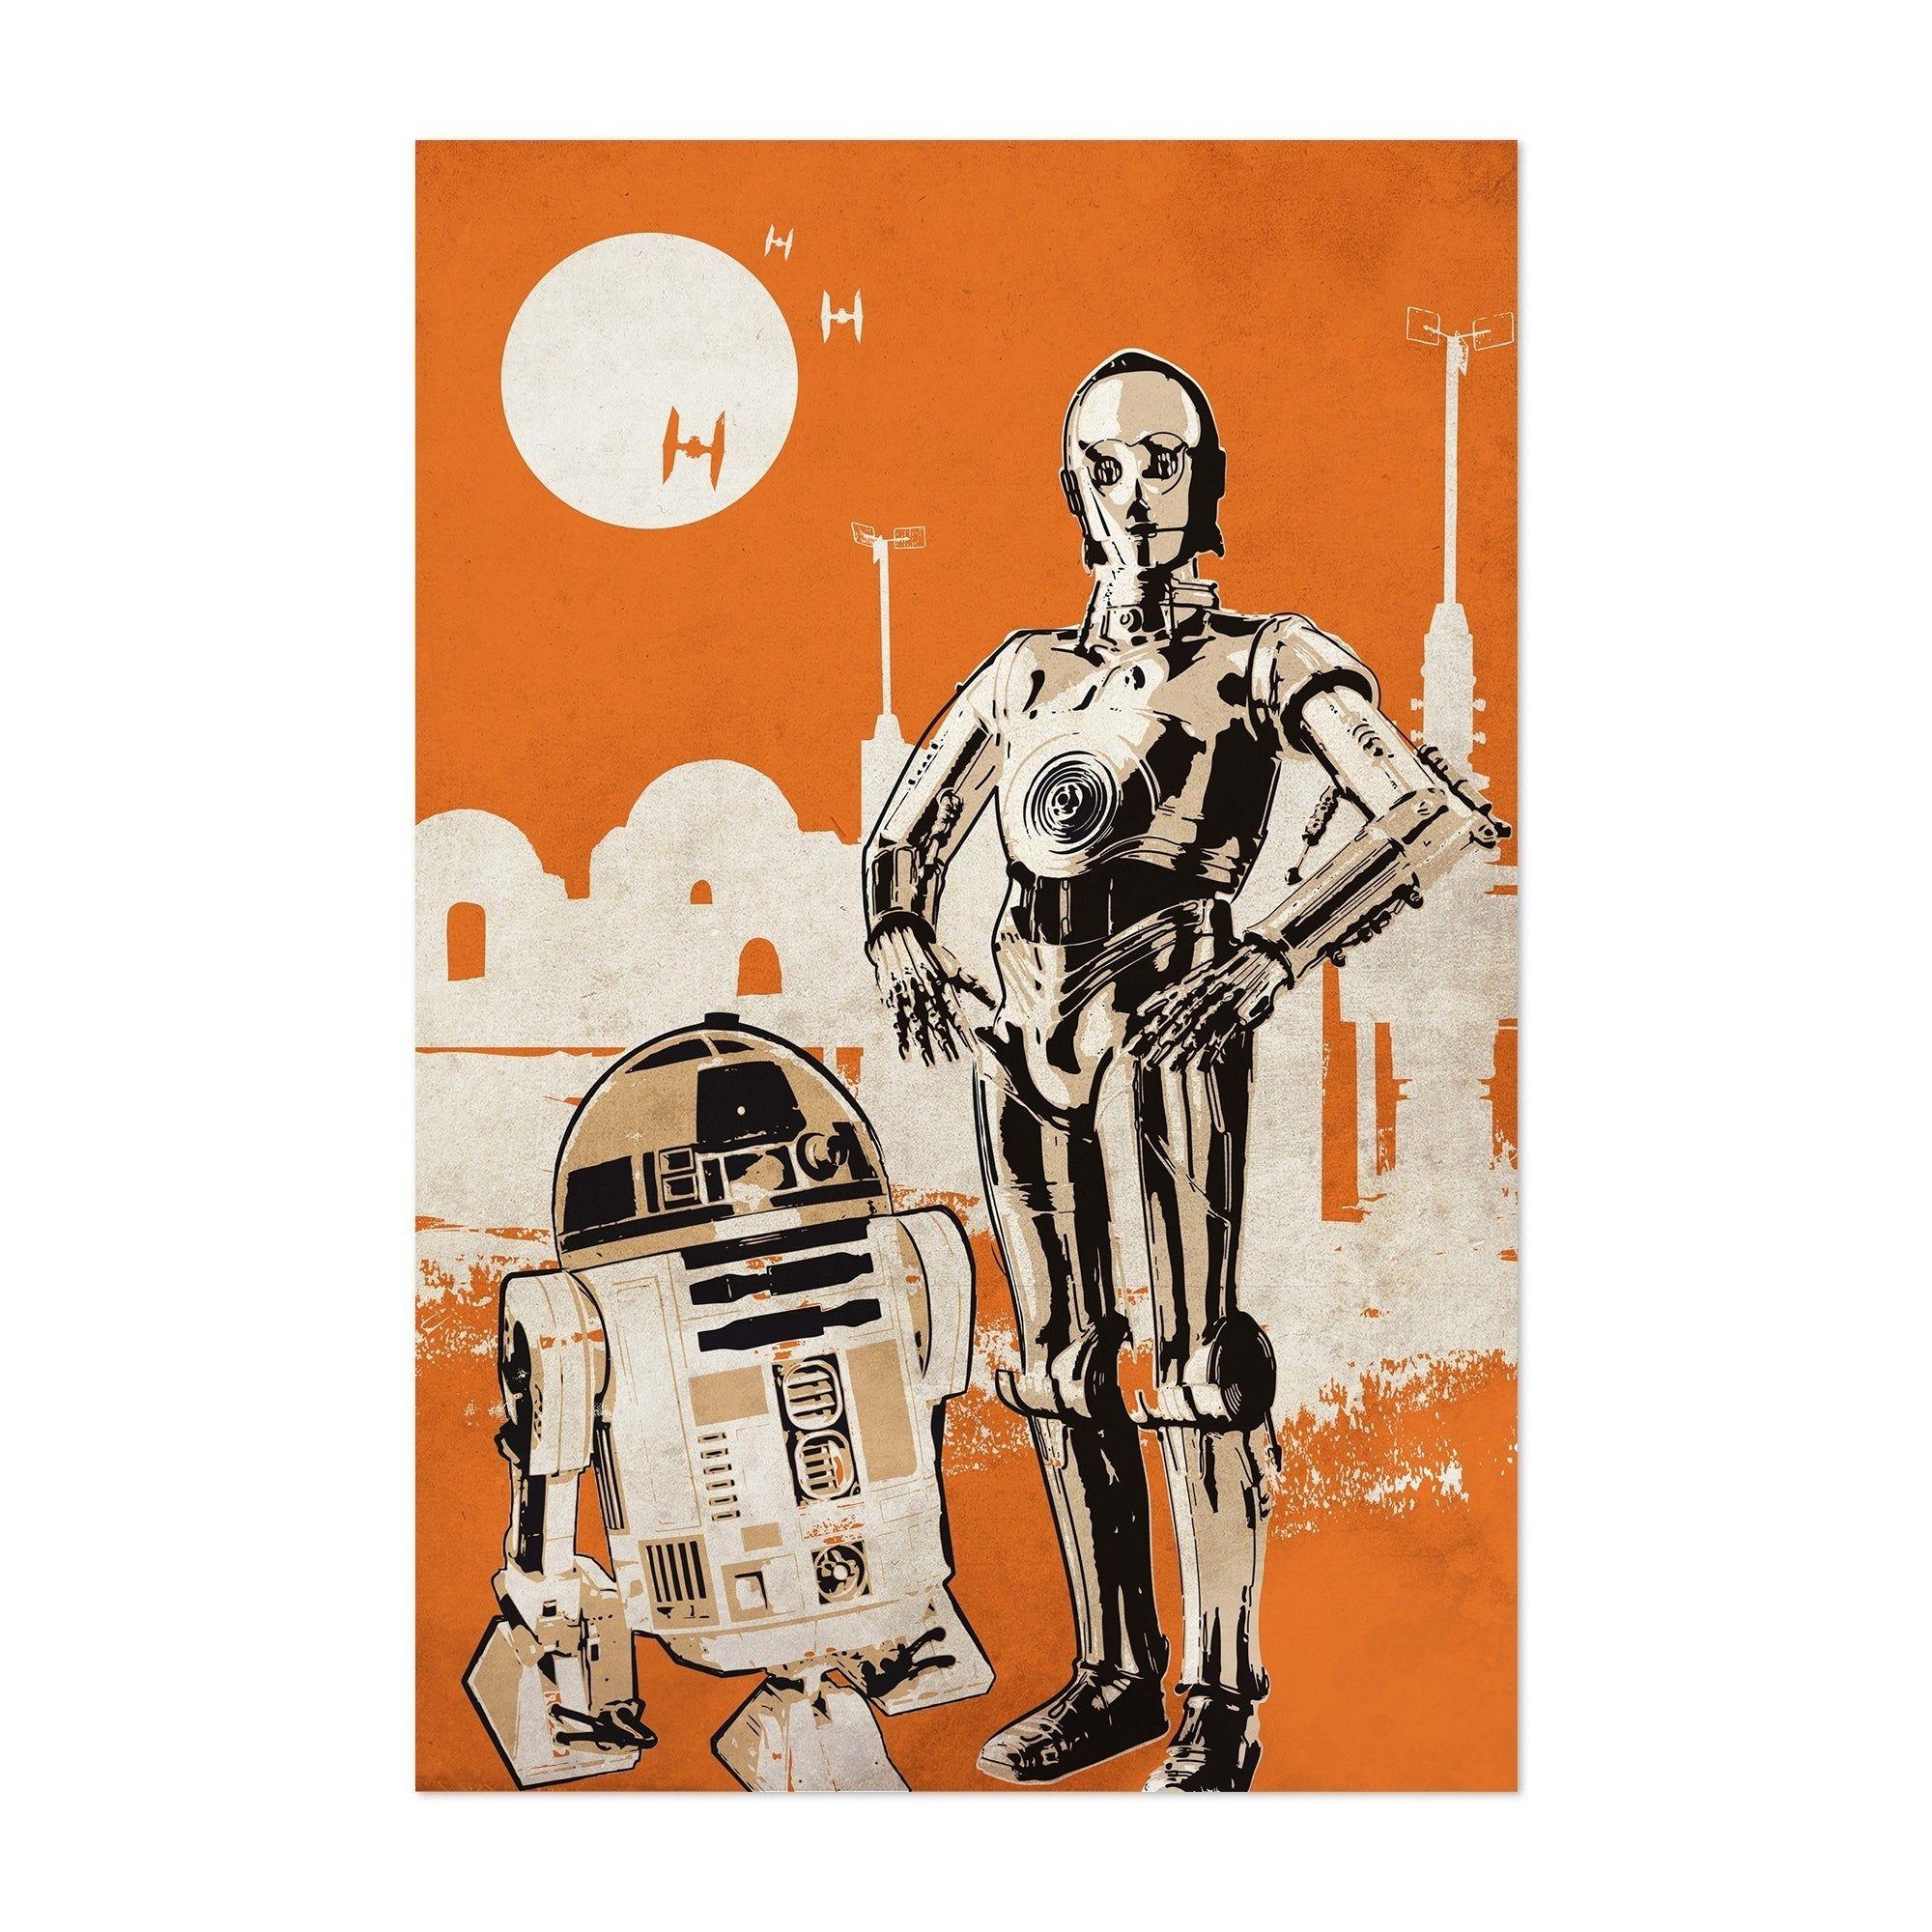 STAR WARS Robots Droids C-3PO Movie Gift Disney Poster UNFRAMED NEW